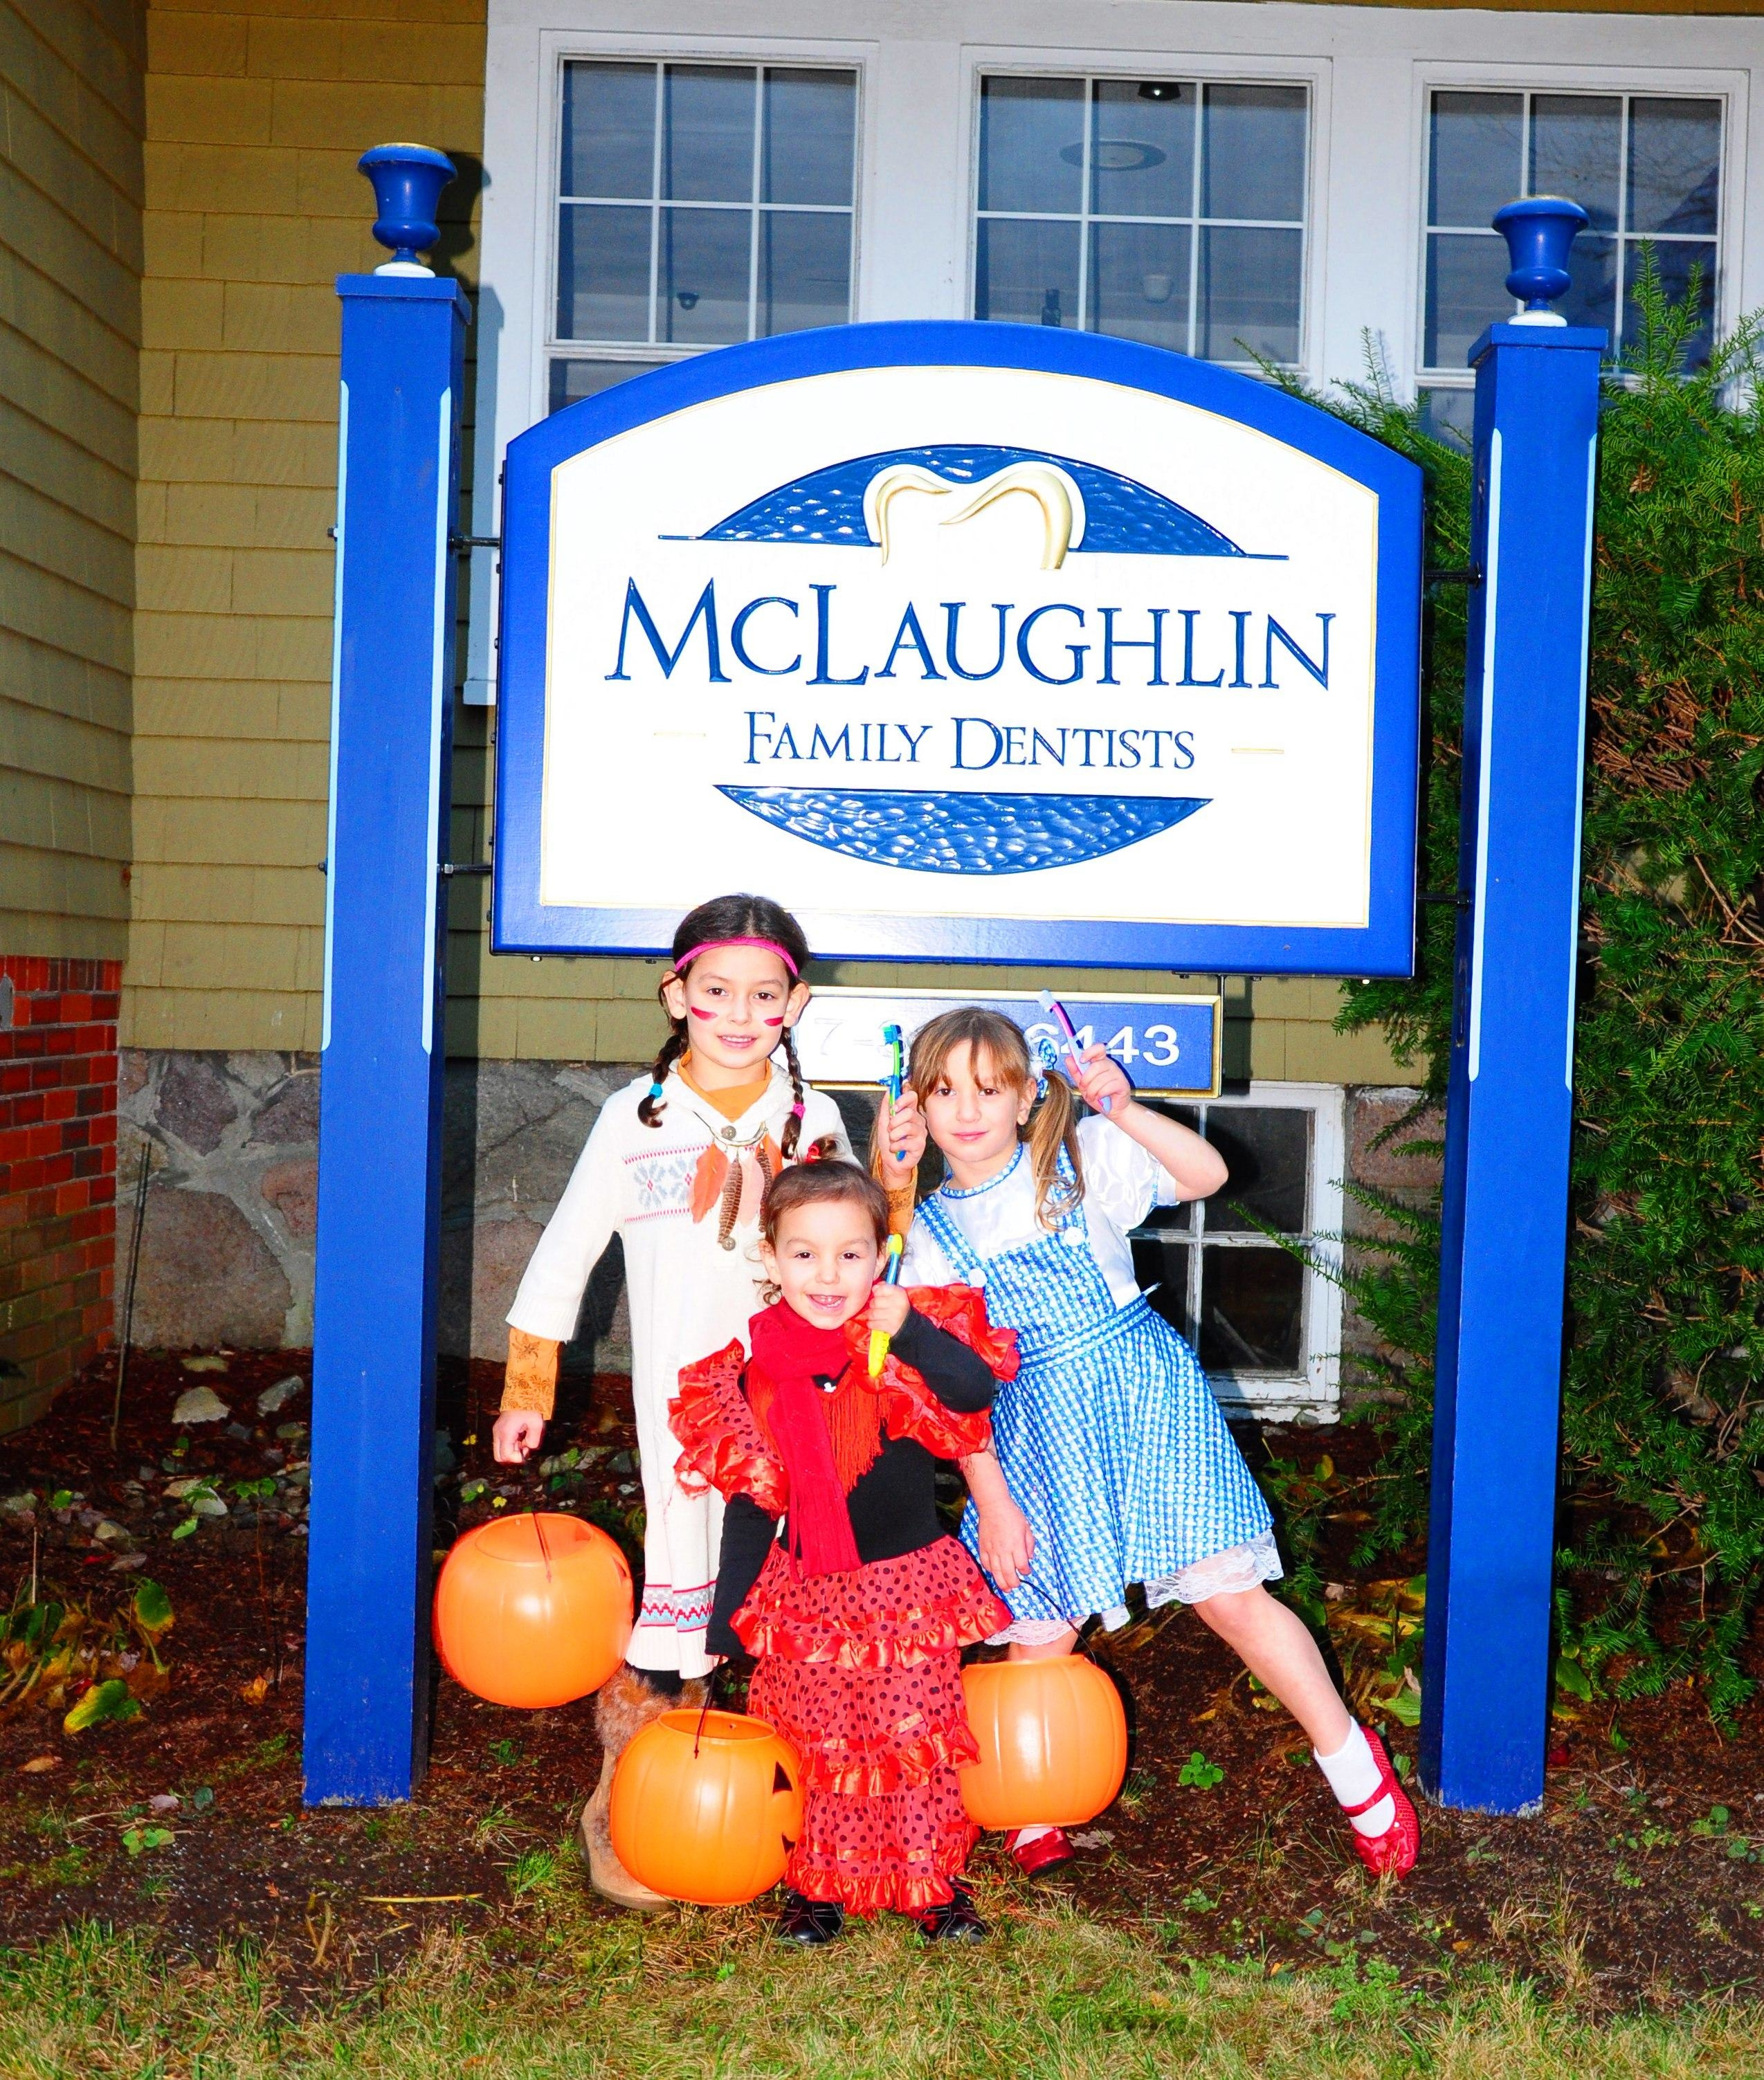 McLaughlin Family Dentists - West Roxbury image 3